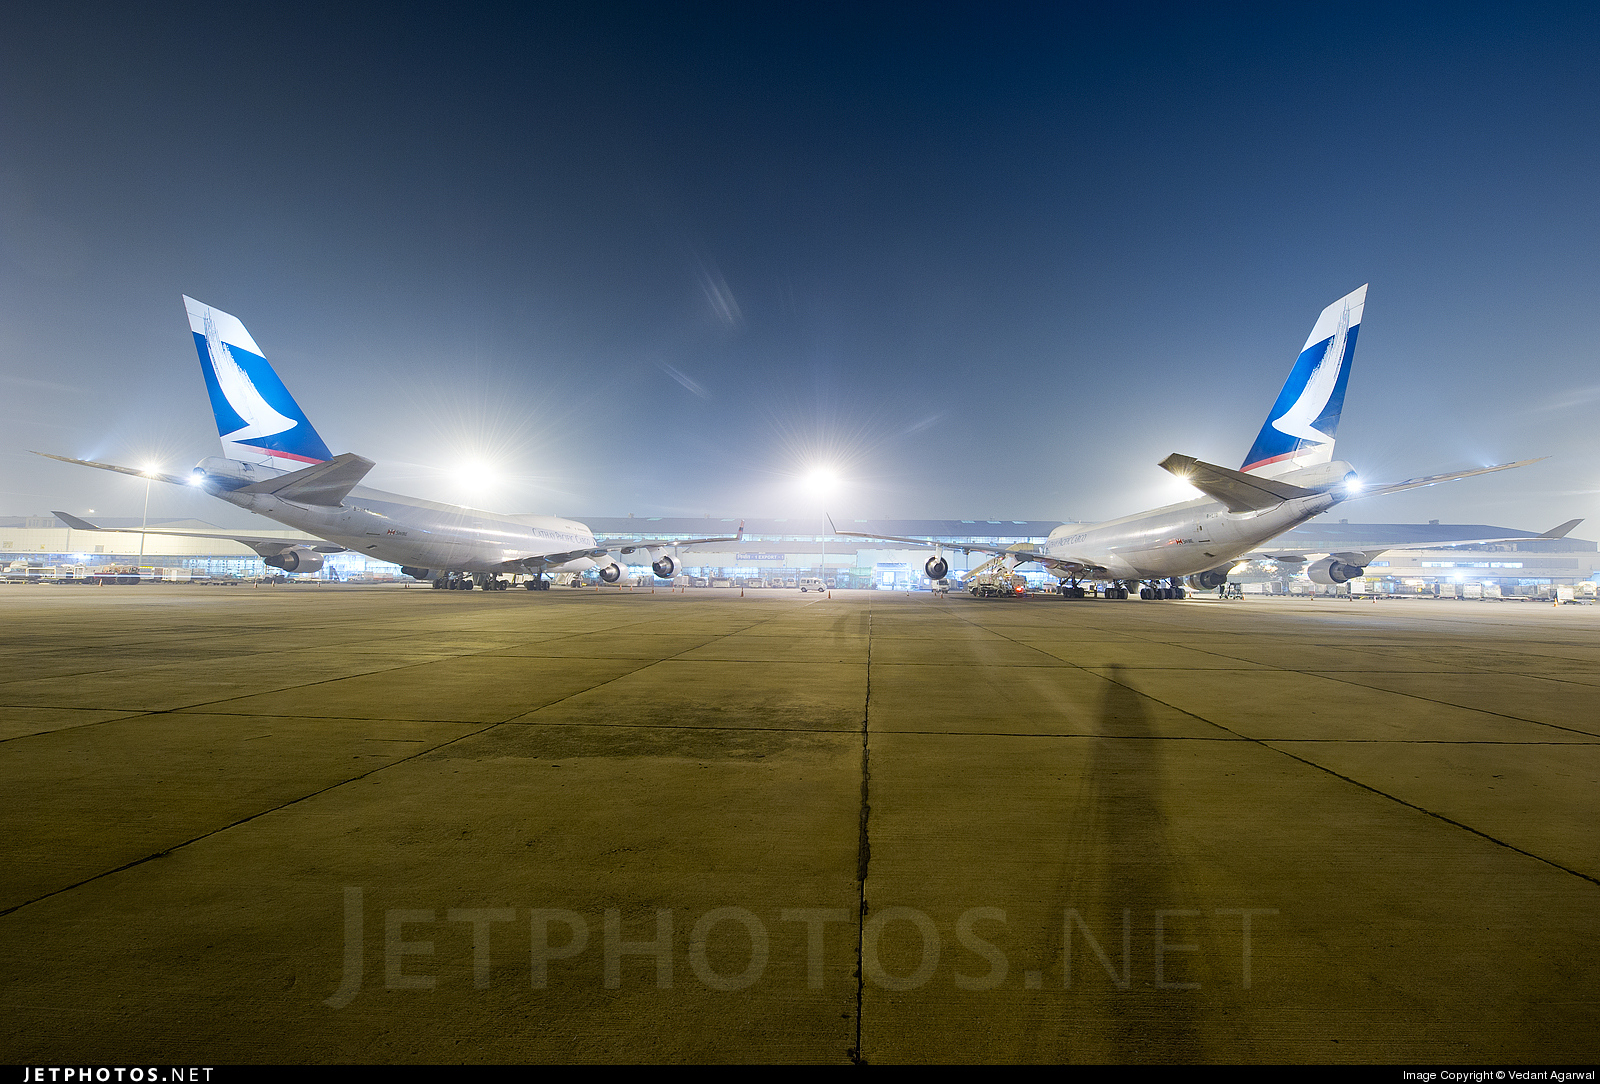 VIDP - Airport - Ramp